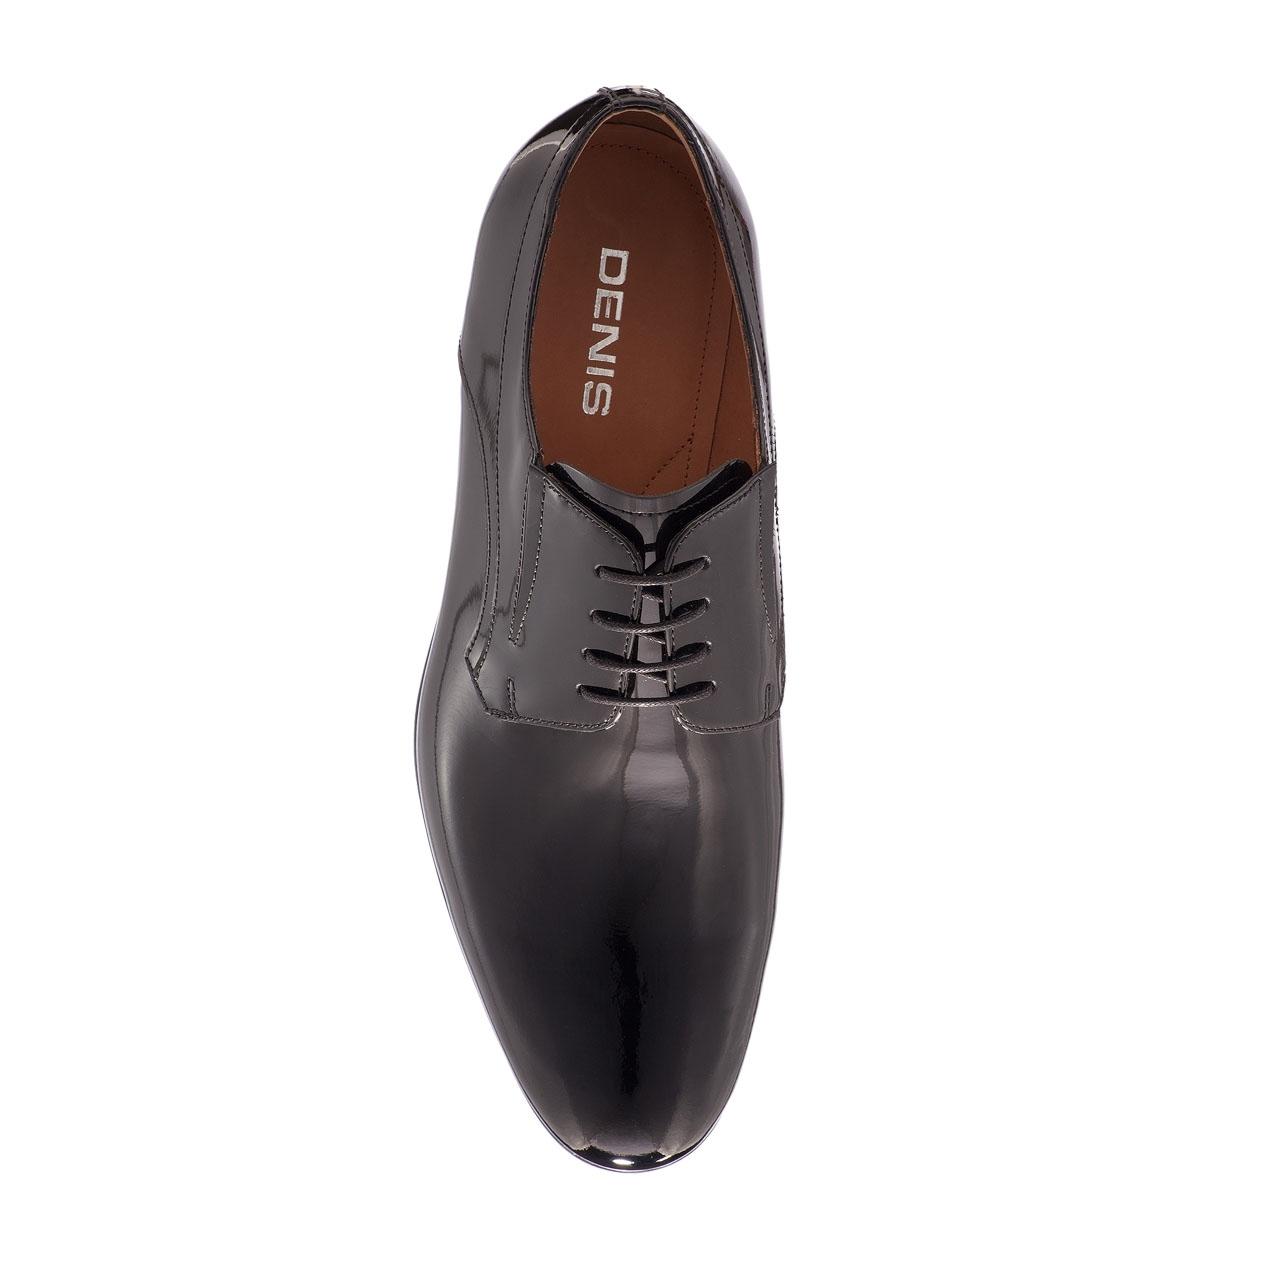 Imagine Pantofi Eleganti Barbati 6802 Lac Negru